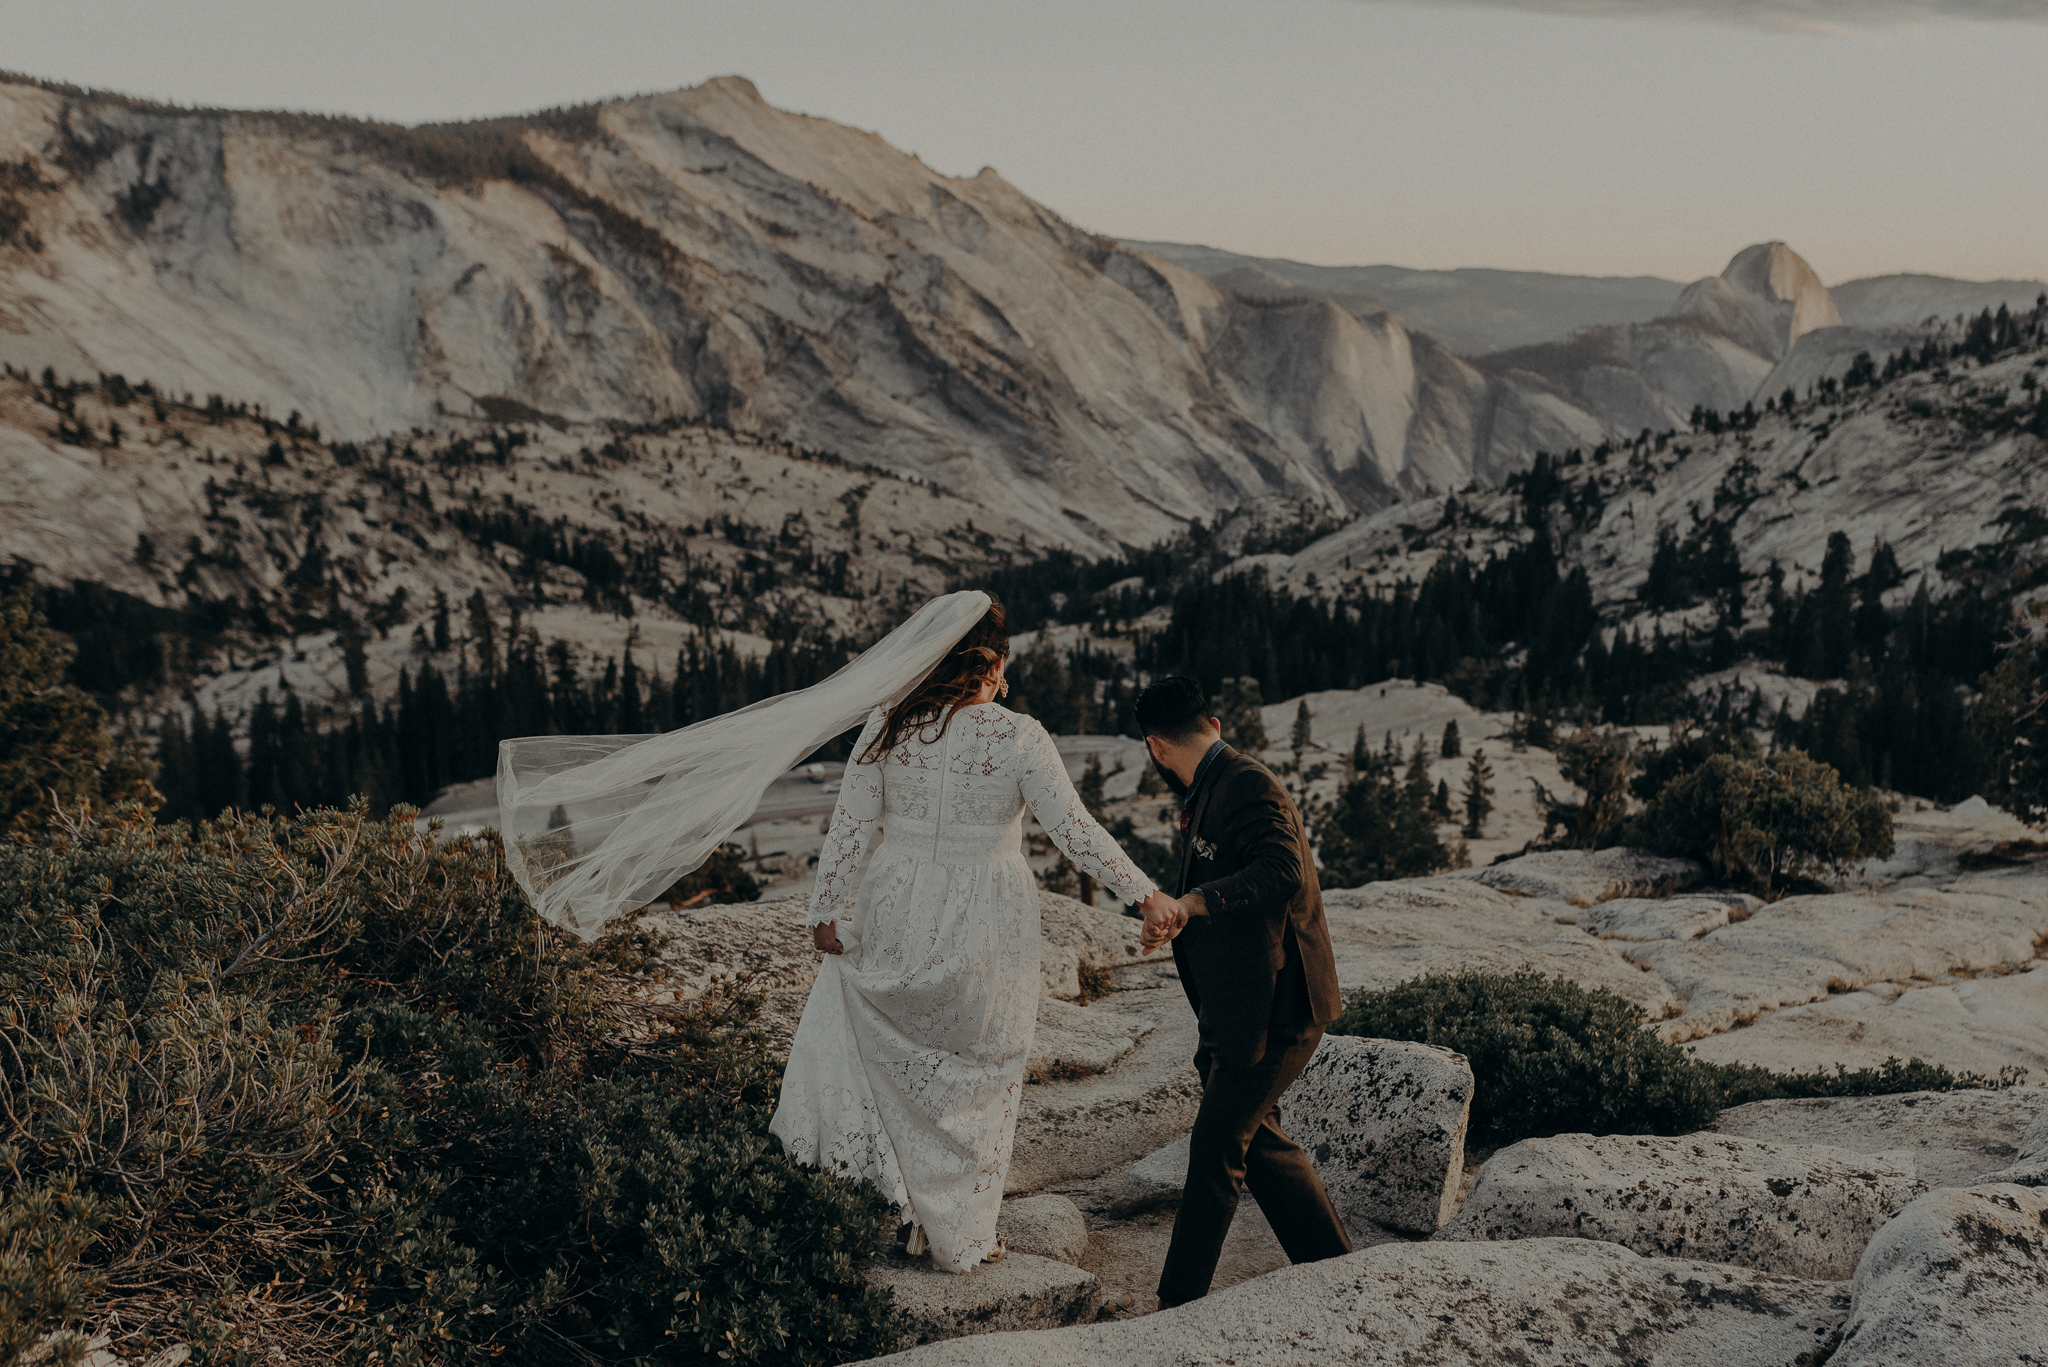 Yosemite Elopement Photographer - Evergreen Lodge Wedding Photographer - IsaiahAndTaylor.com-050.jpg